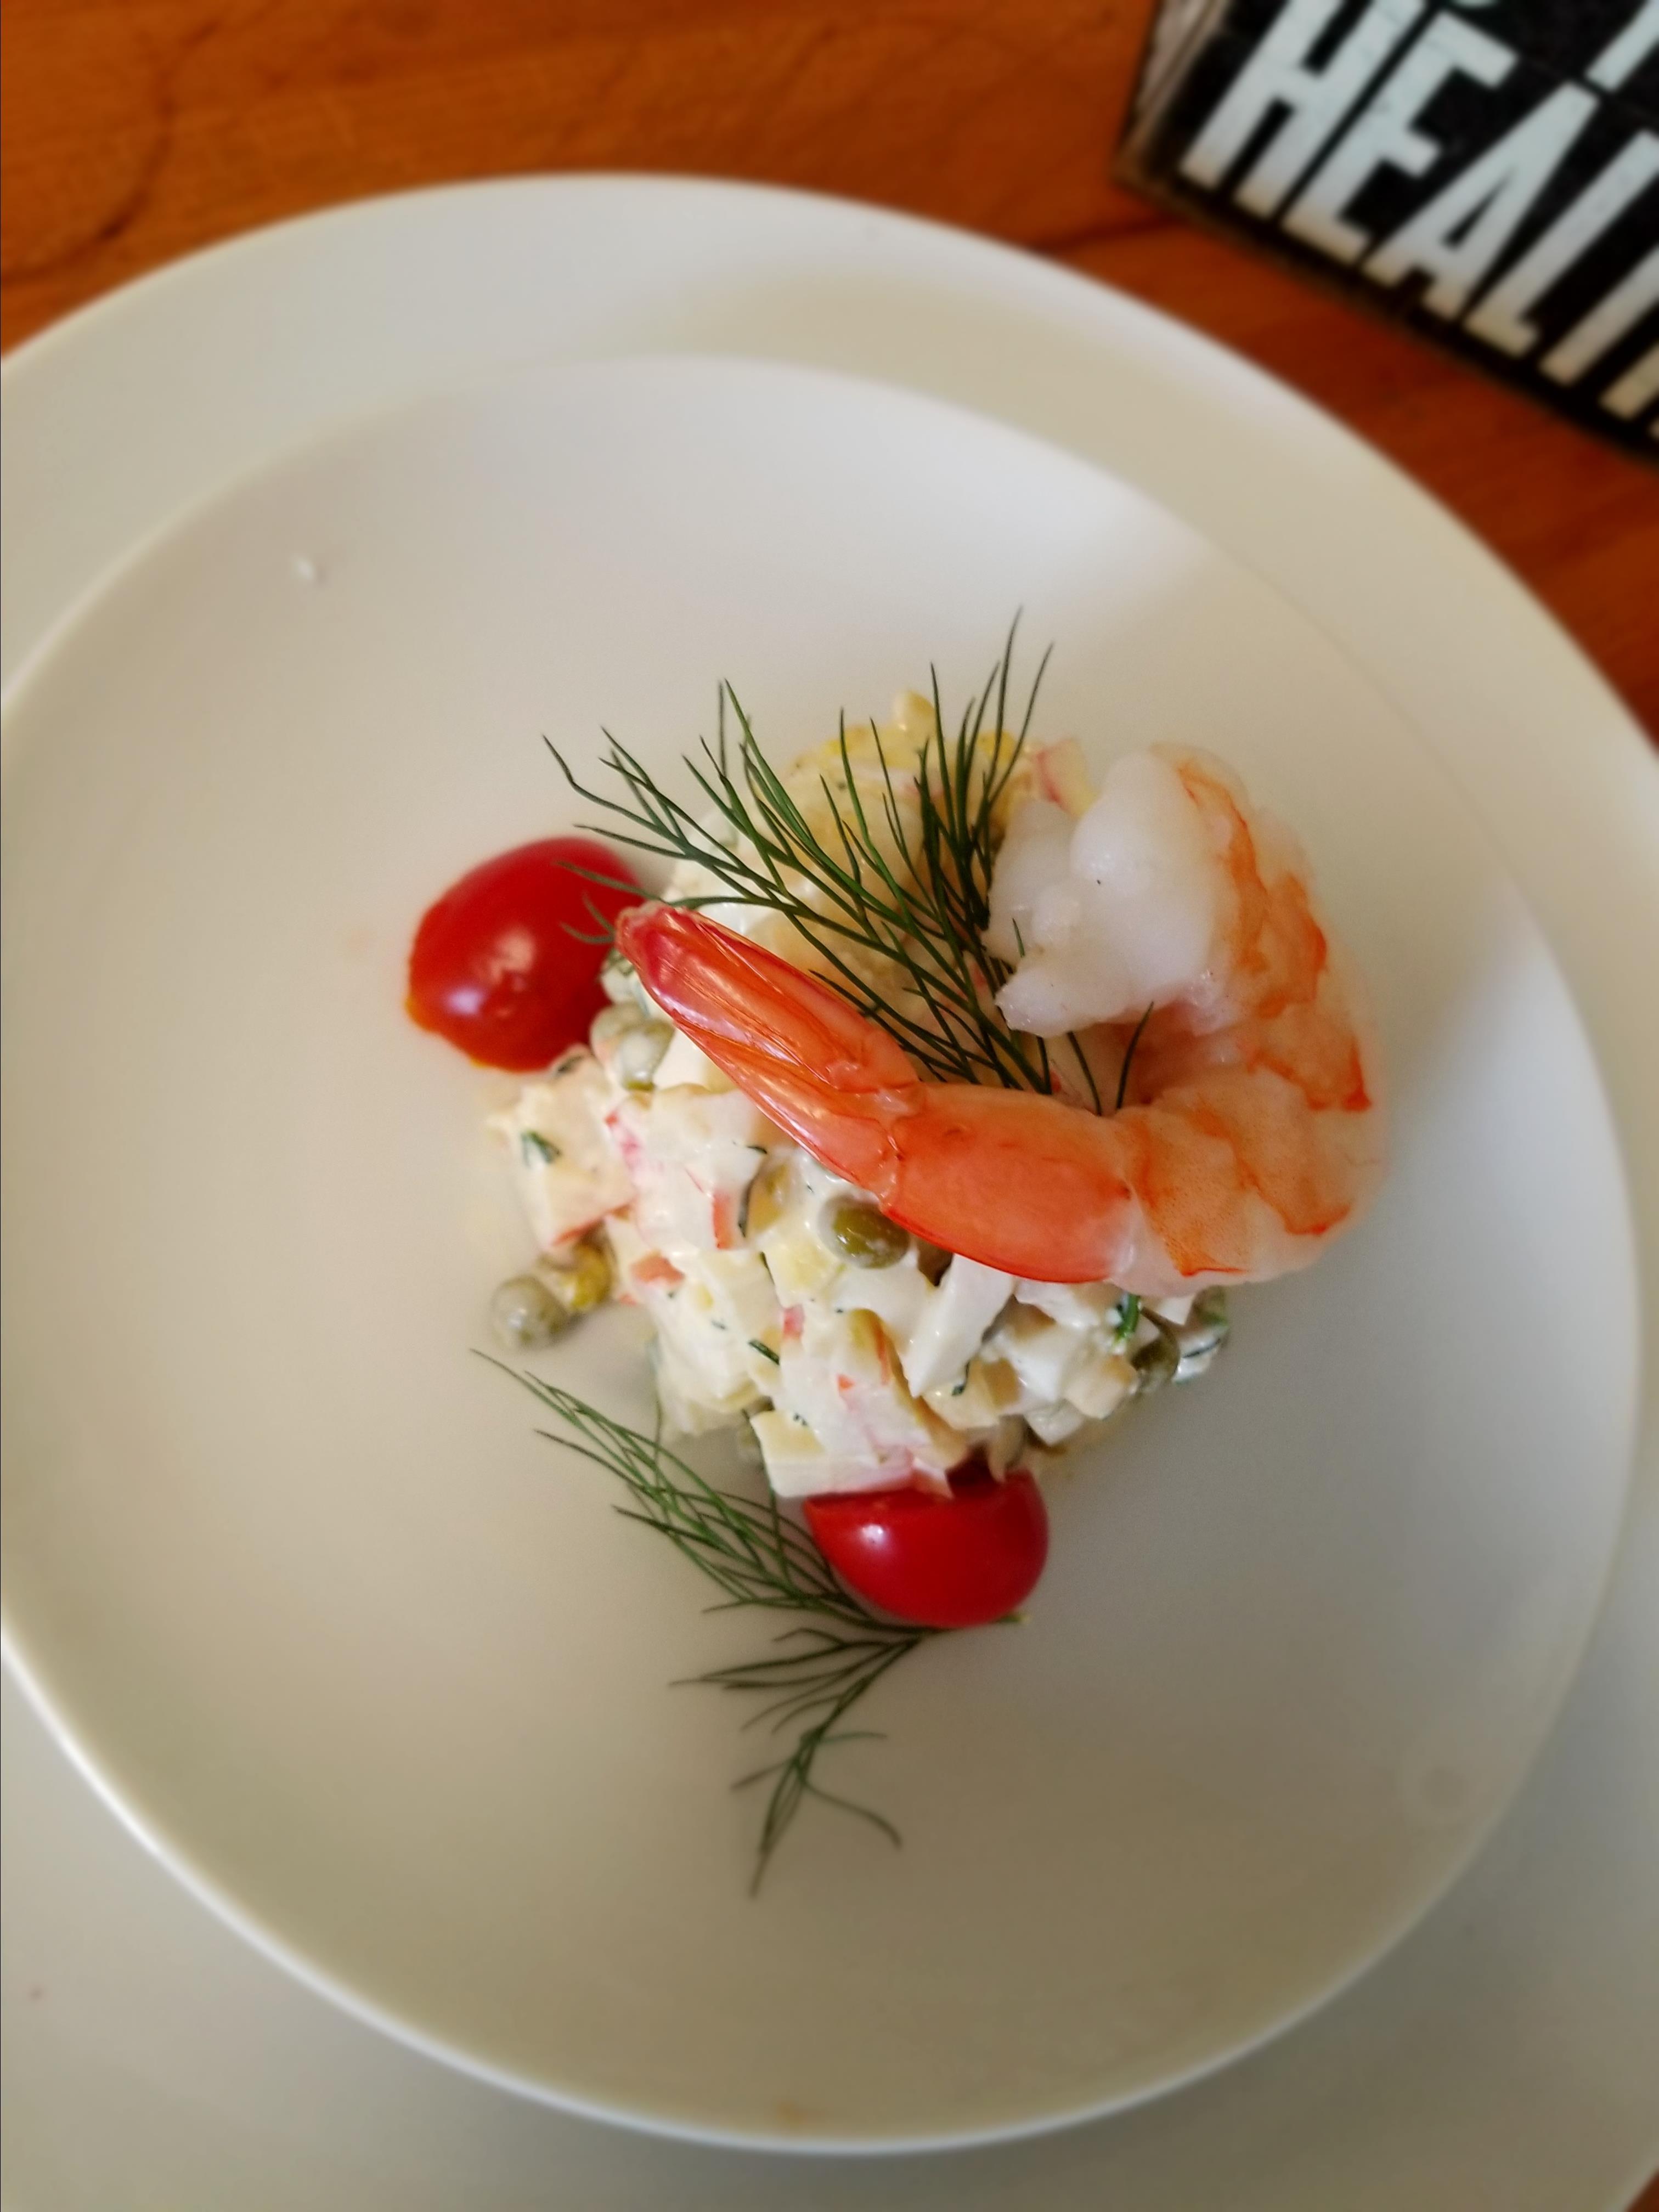 Simple Crab and Shrimp Salad